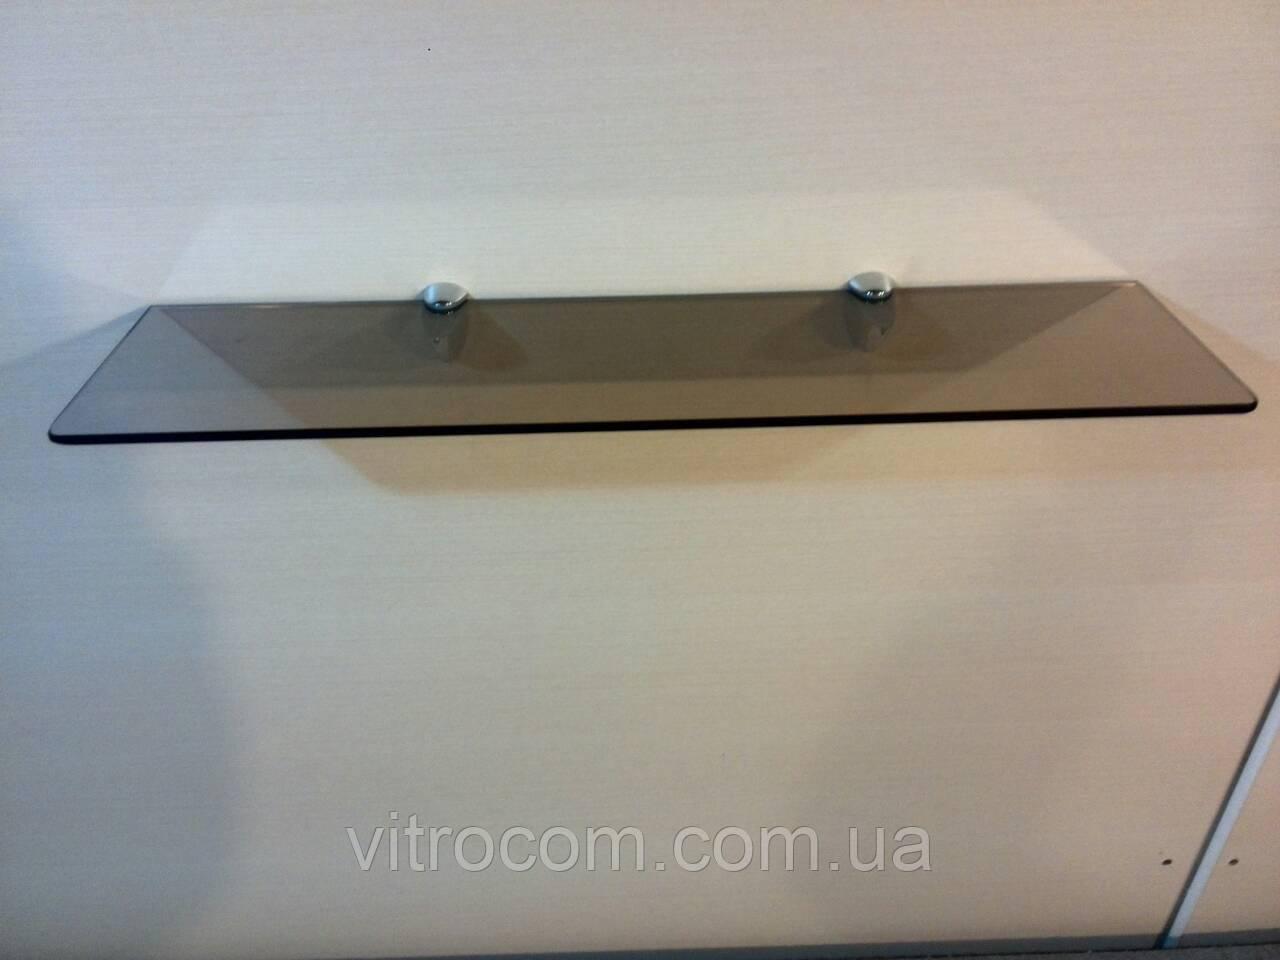 Полка 6 мм стеклянная бронзовая 60х15 см